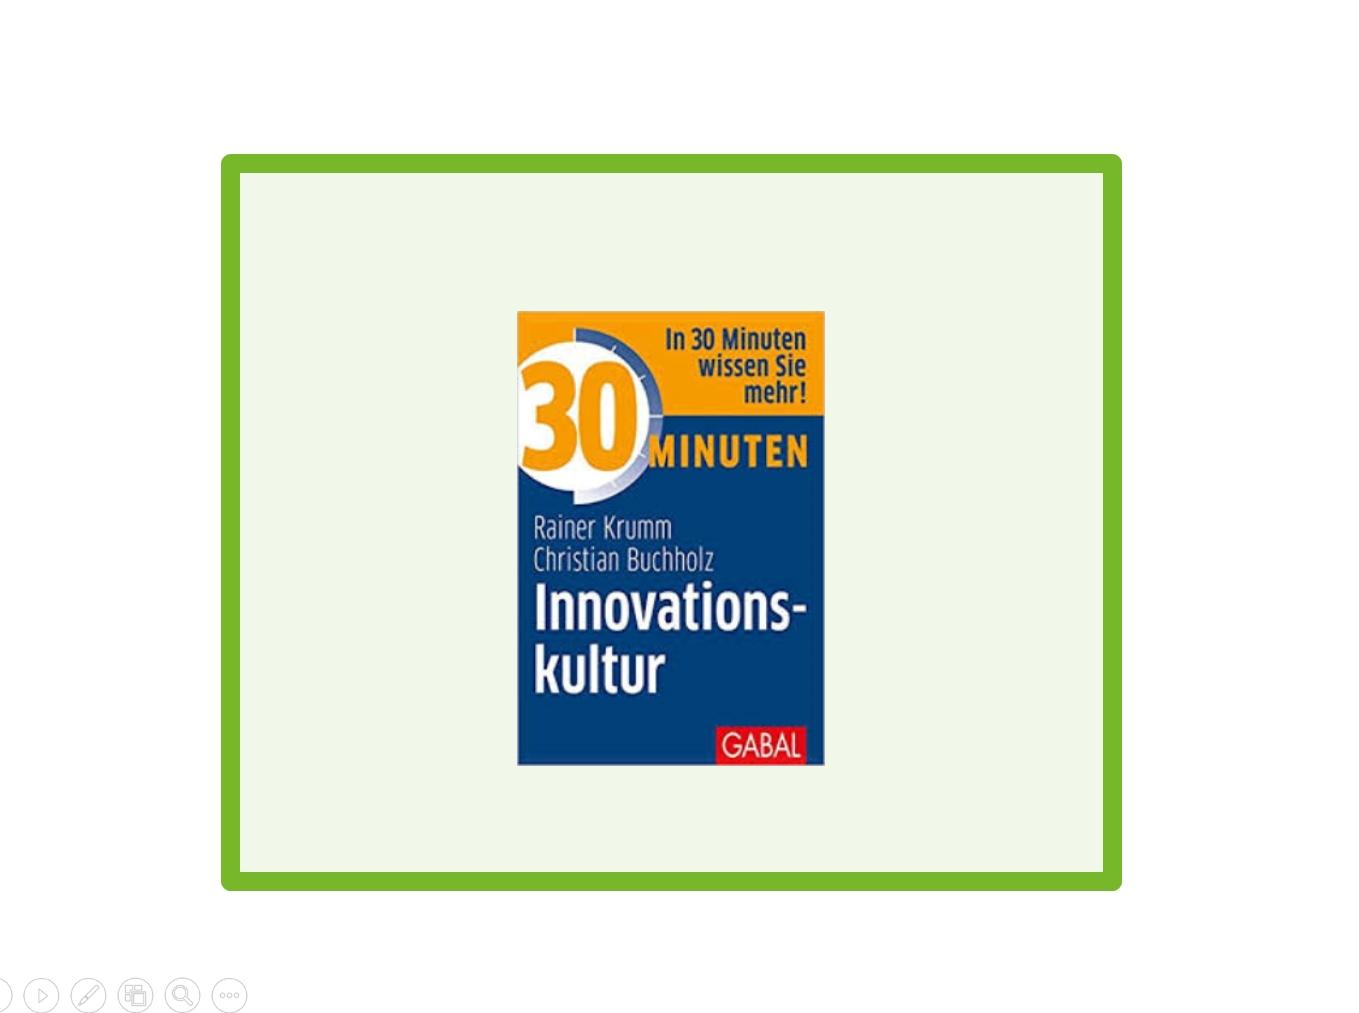 innovation, innovationskultur, rainer krumm, christian buchholz, kreativität, wertesystem